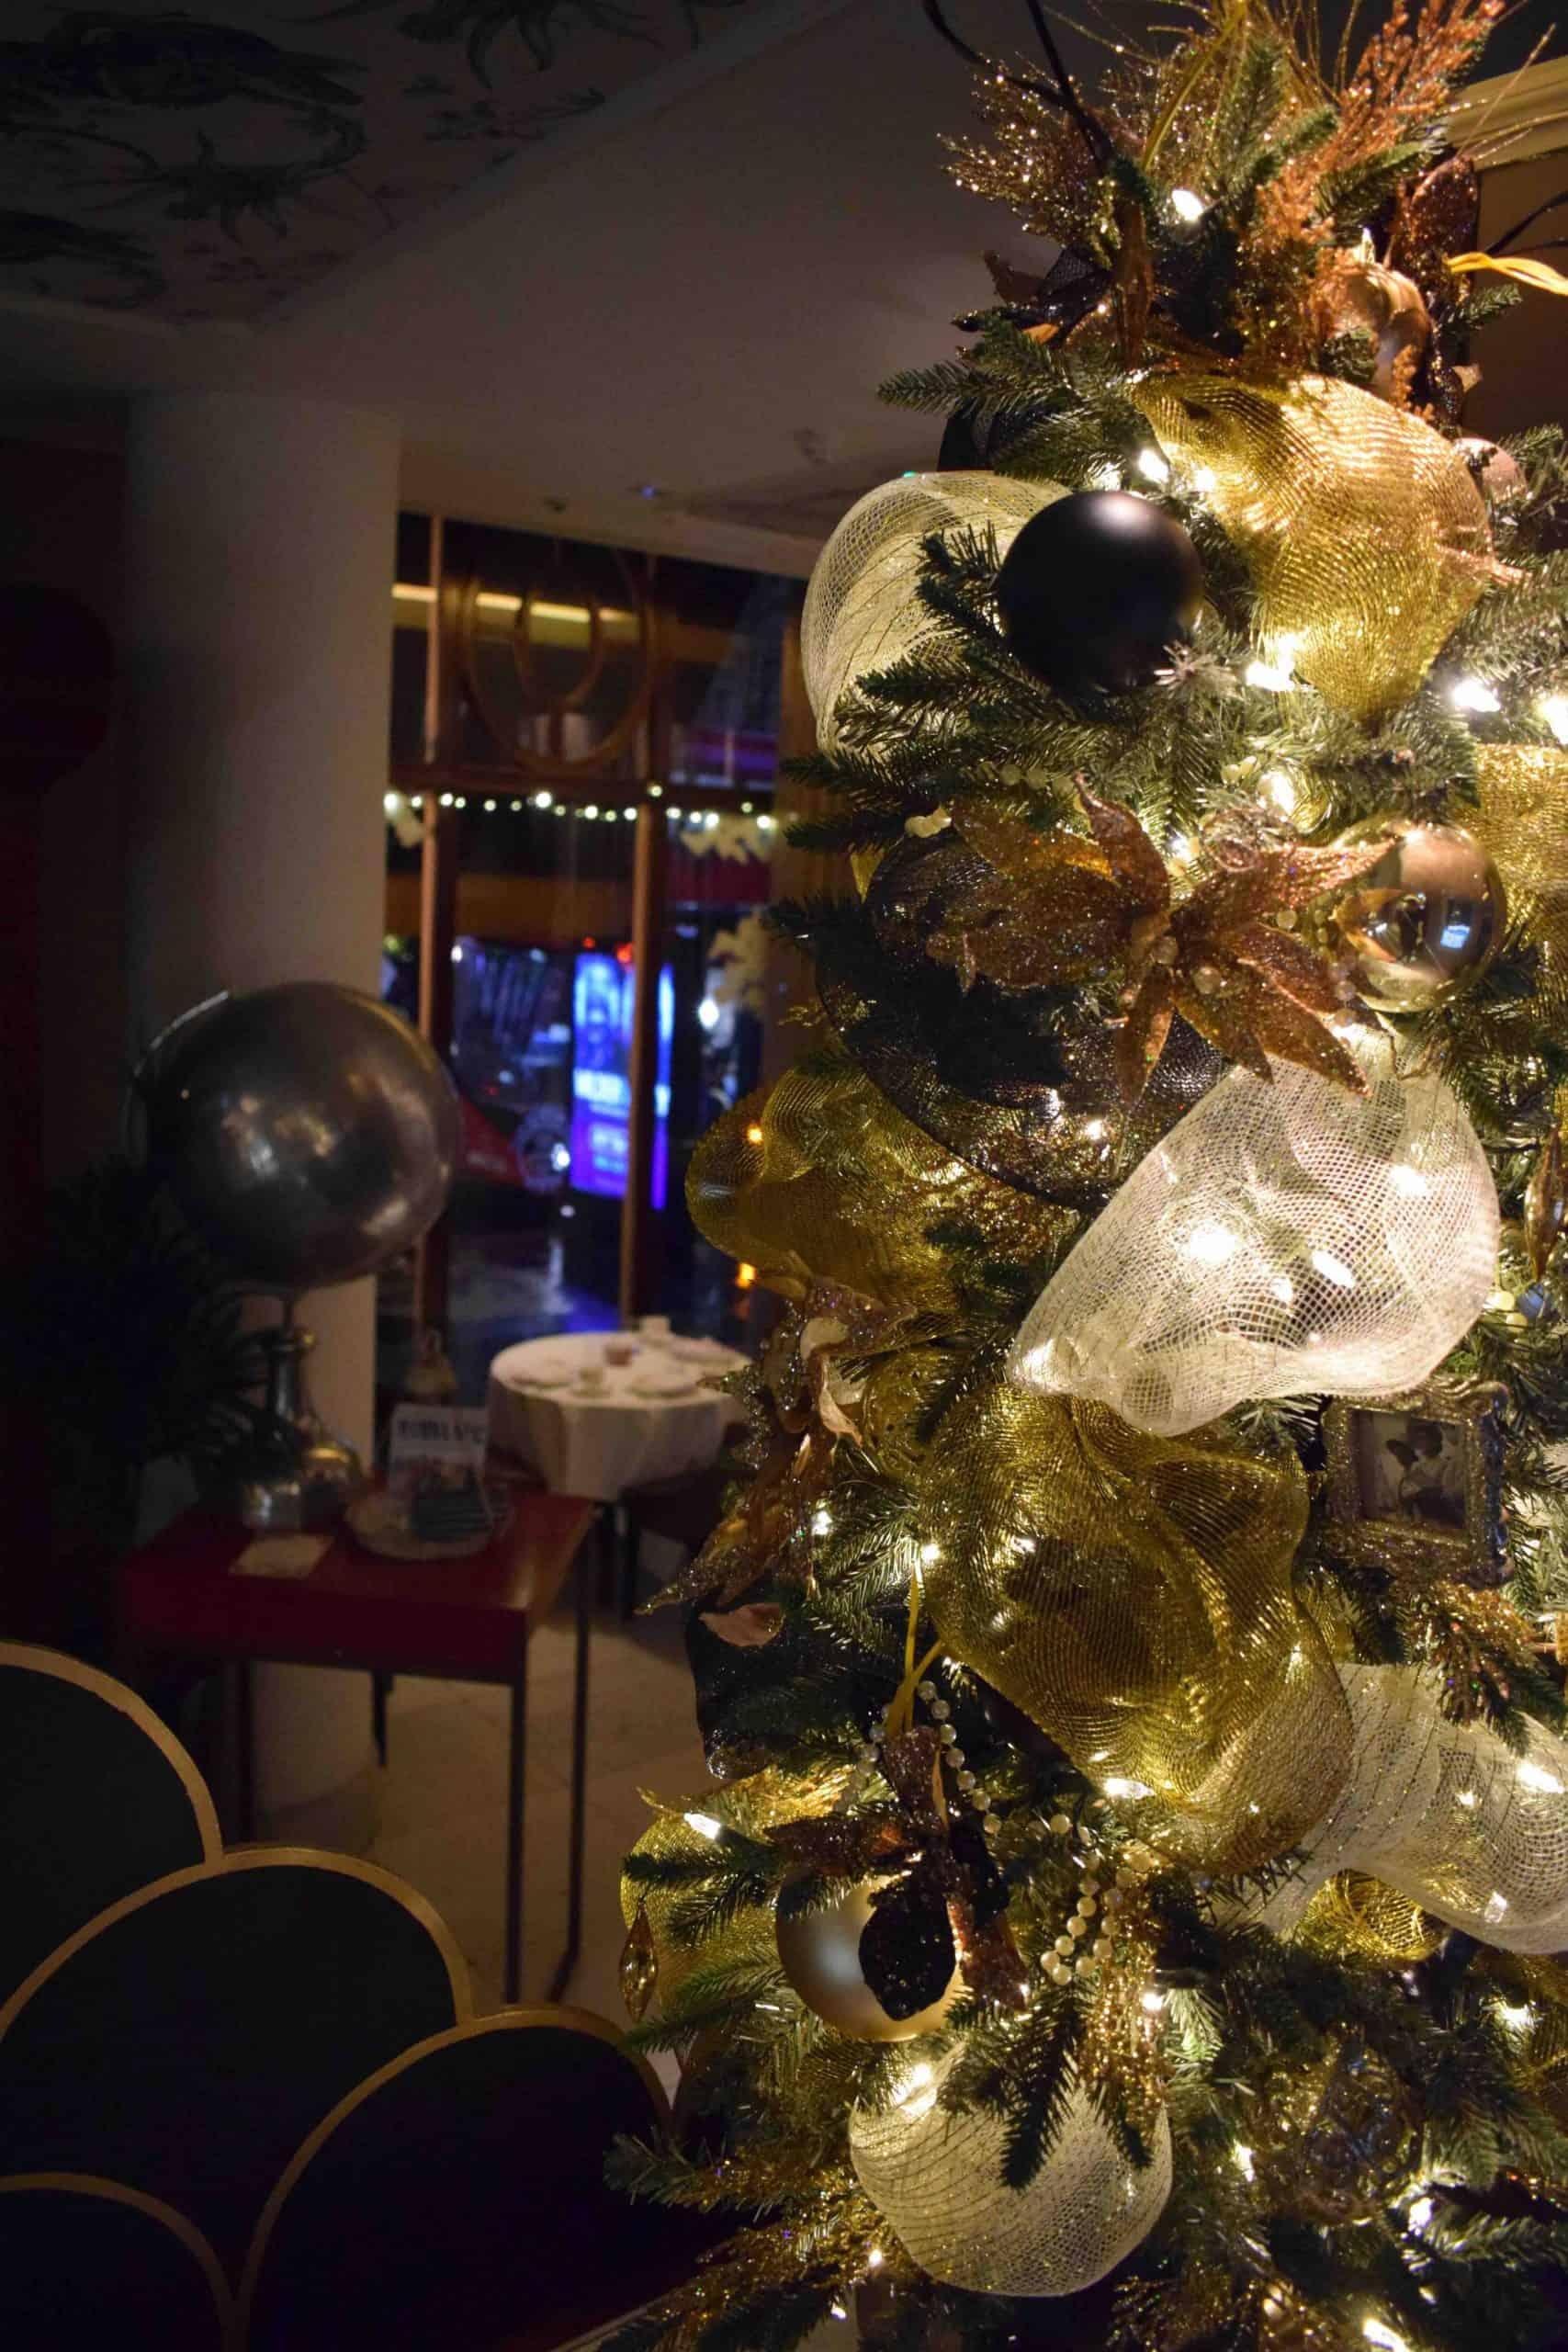 The Waldorf Hilton Christmas Decorations Luxury Christmas Decorations